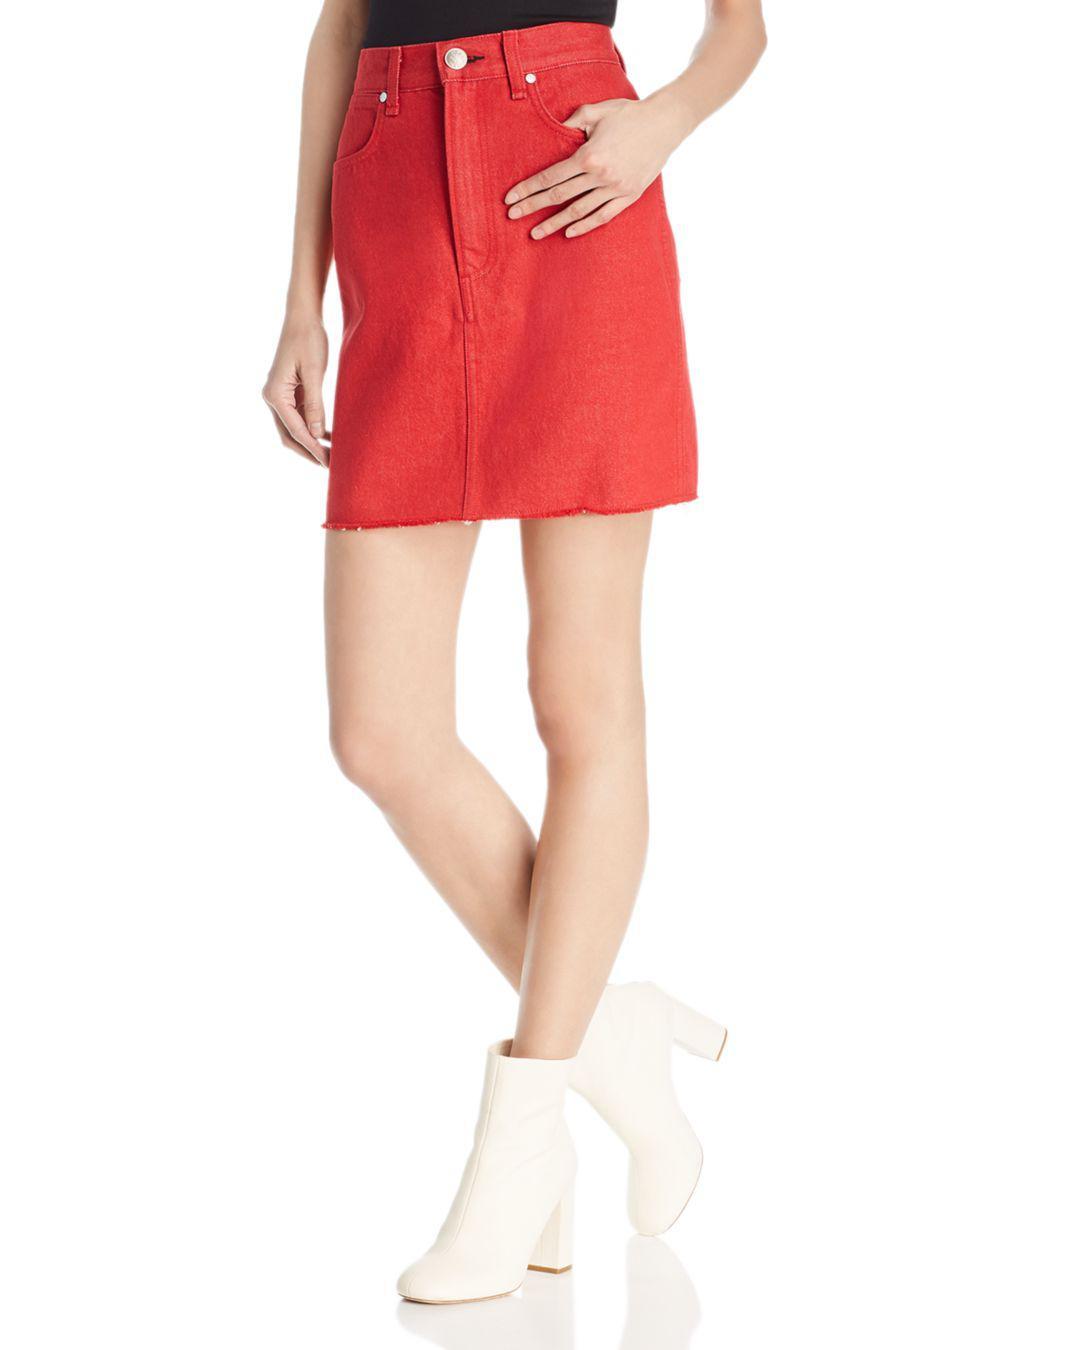 f4b17d7d45 Rag & Bone Moss Denim Skirt in Red - Lyst